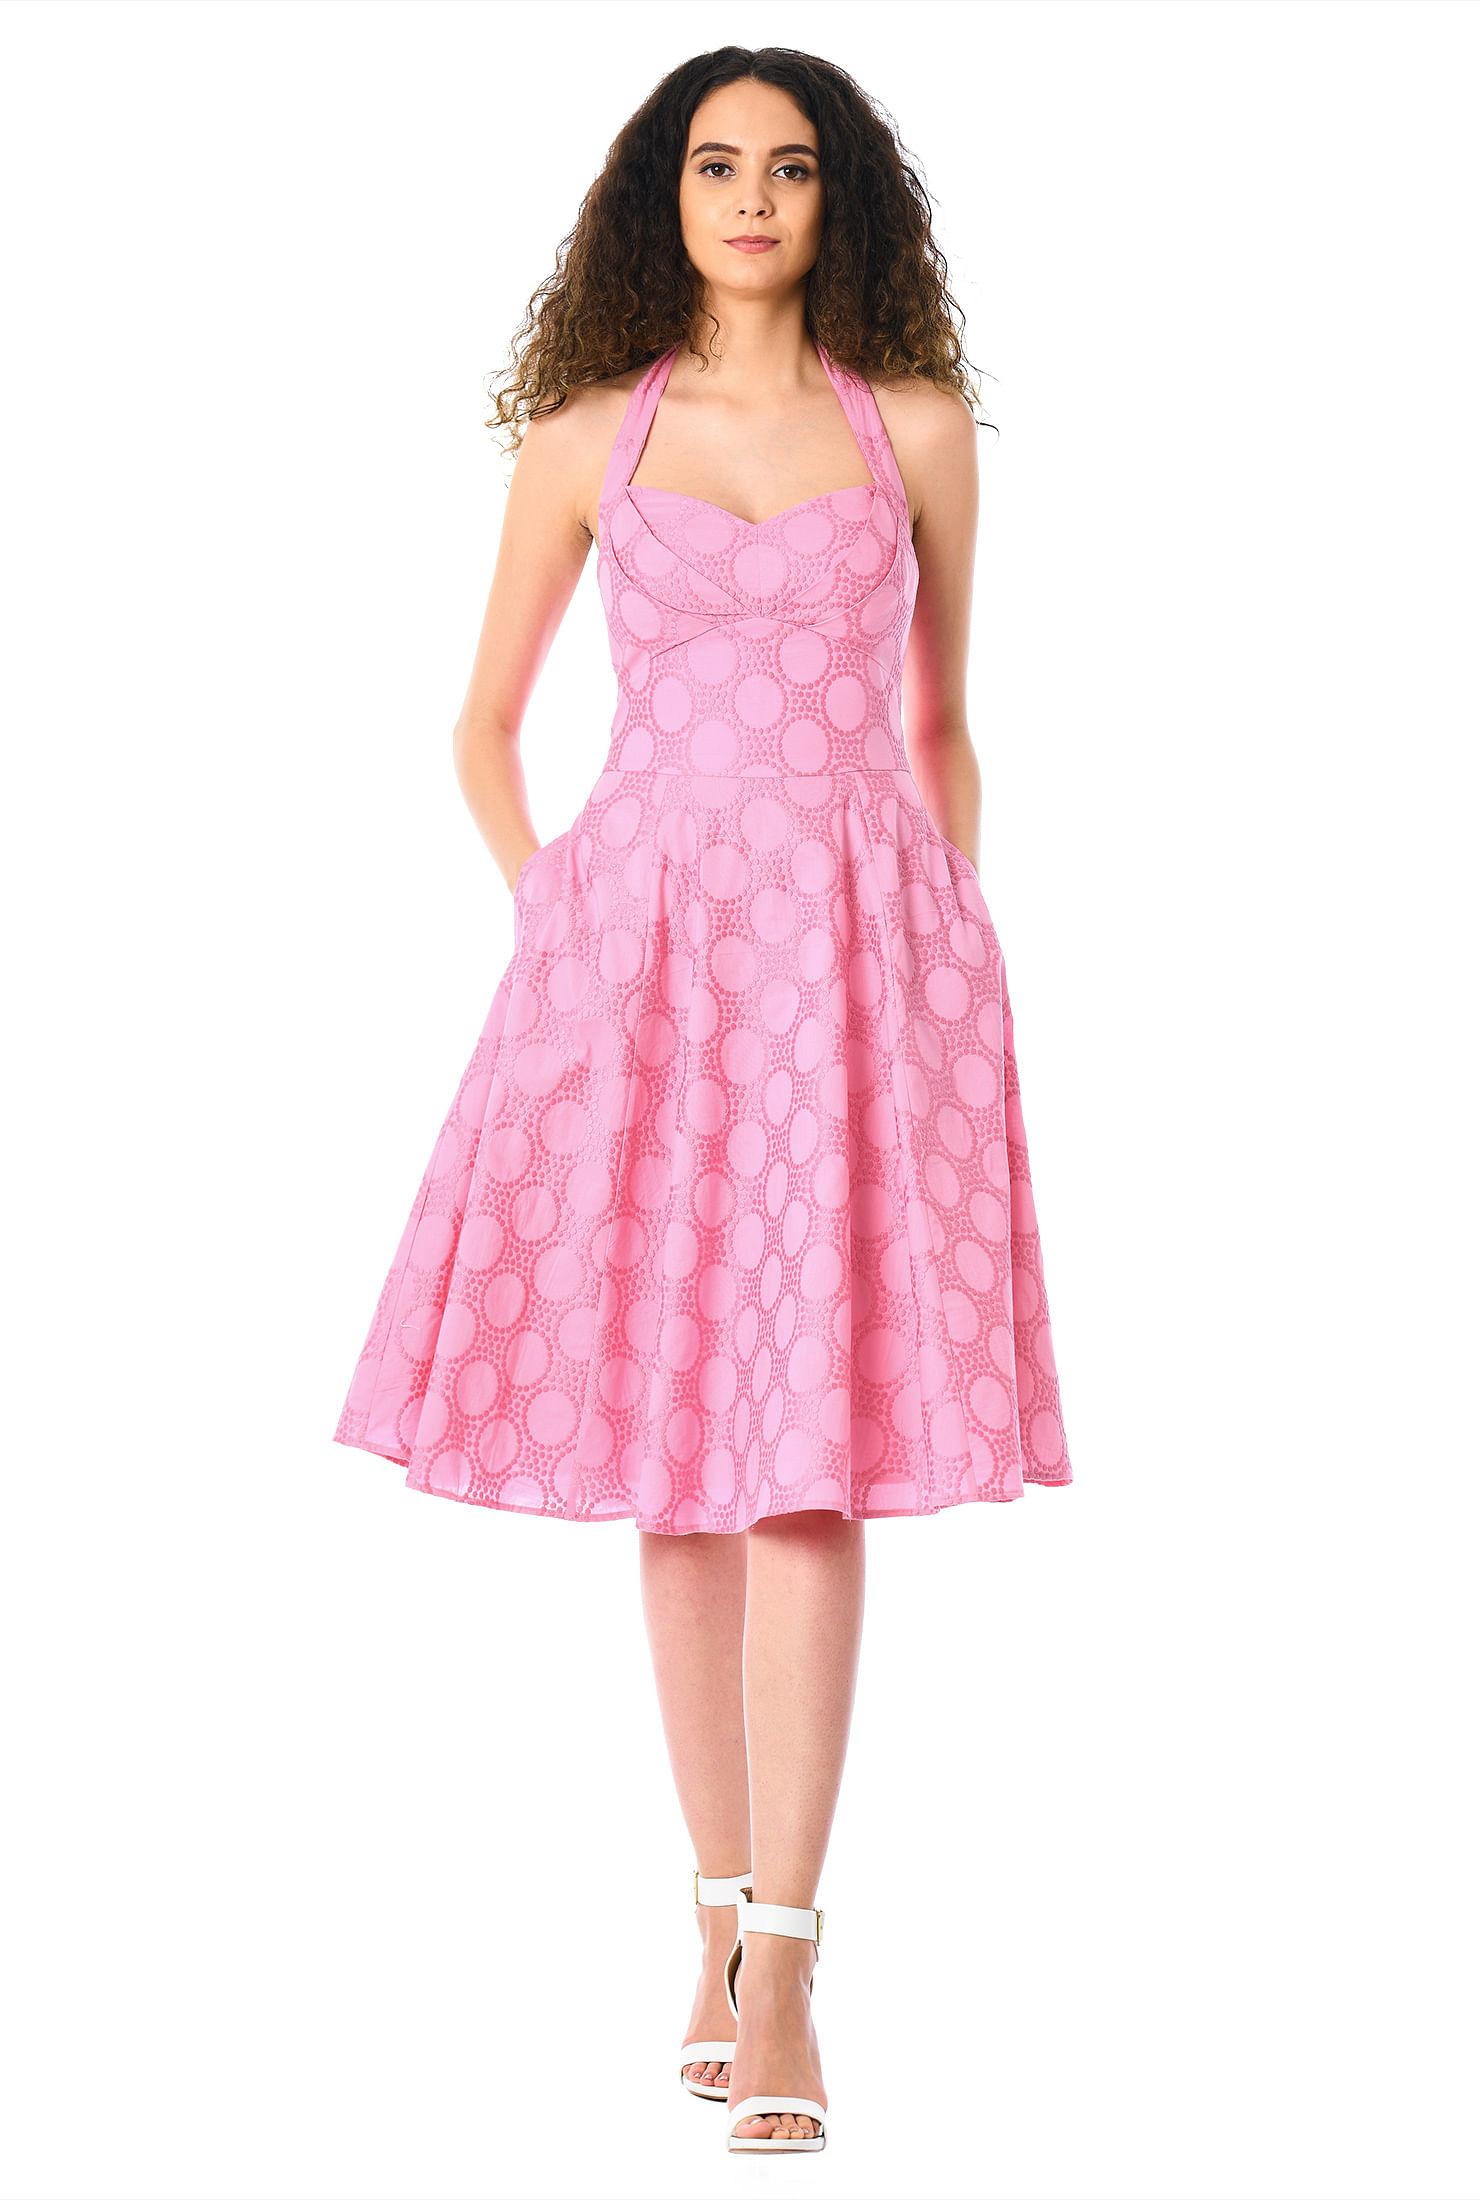 d82e91bb1 below knee length dresses, bridesmaid dresses, Brooklyn Dresses, elastic  smocked dresses,